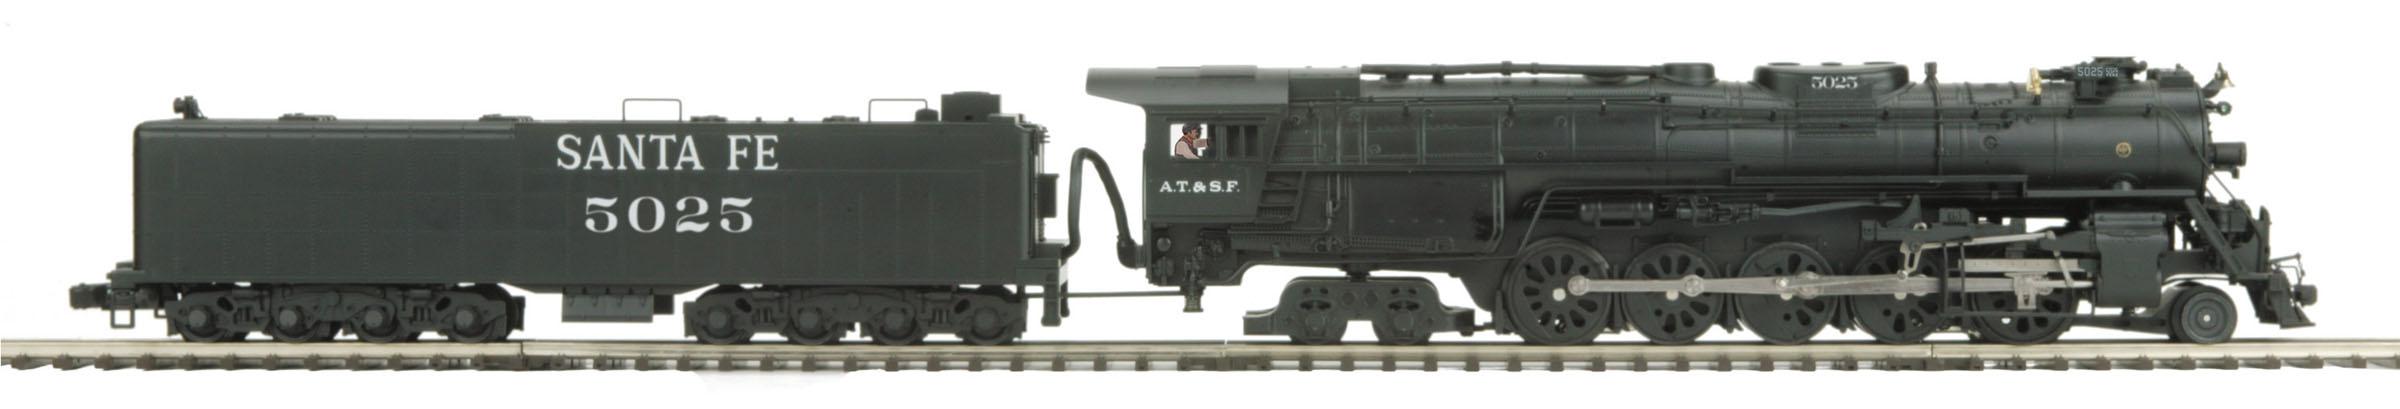 ATSF 5011 Class 2-10-4 Texas